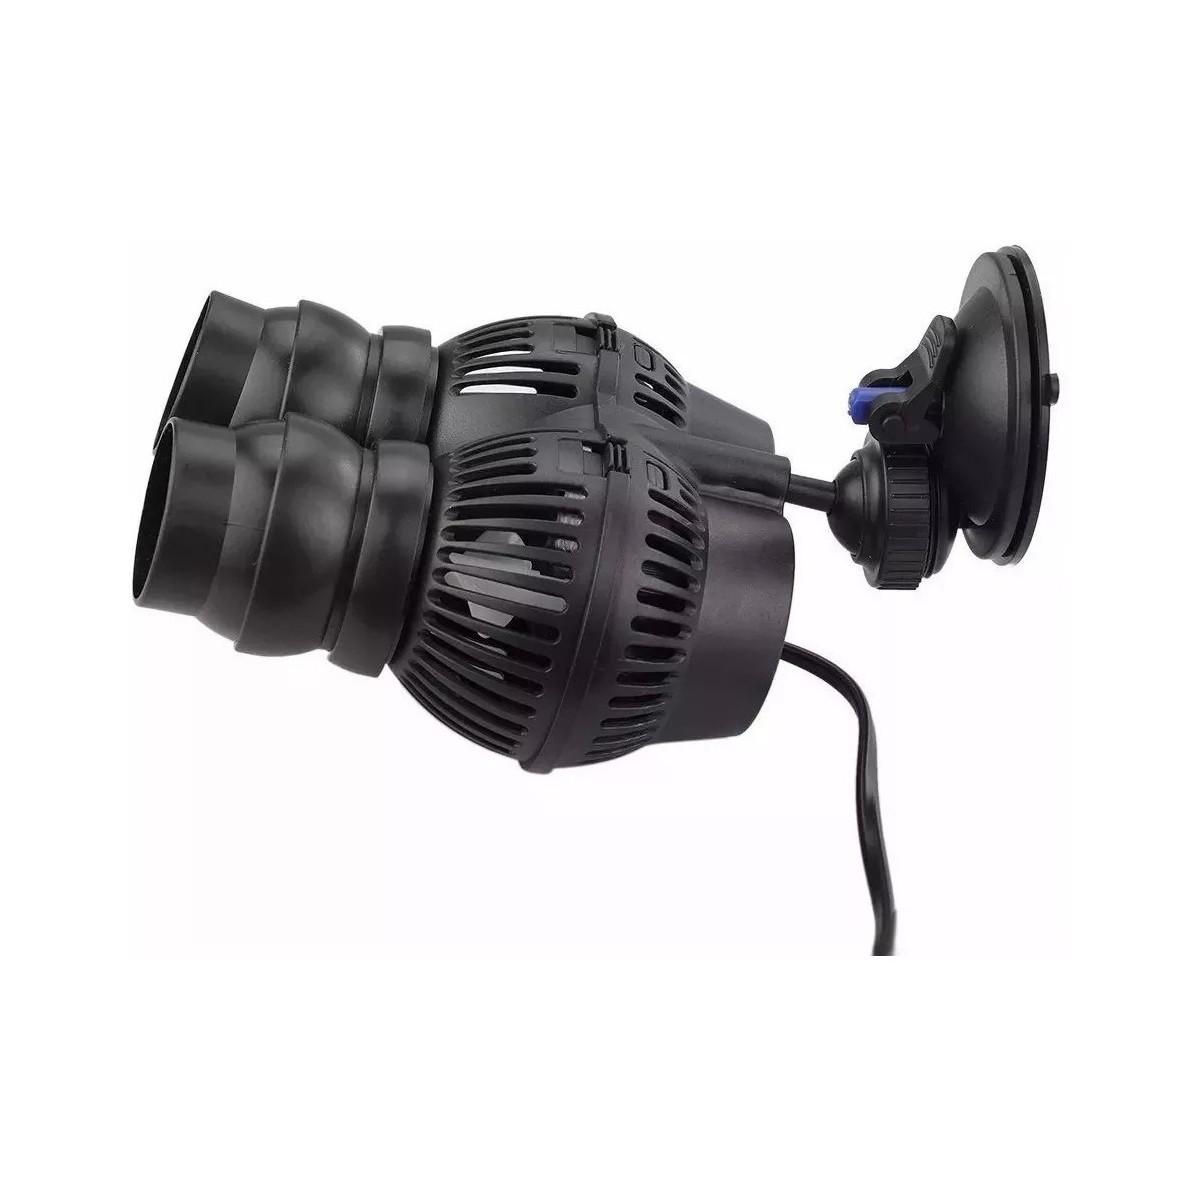 Bomba Wave Maker para Aquários Sunsun  Jvp 201a 6000l